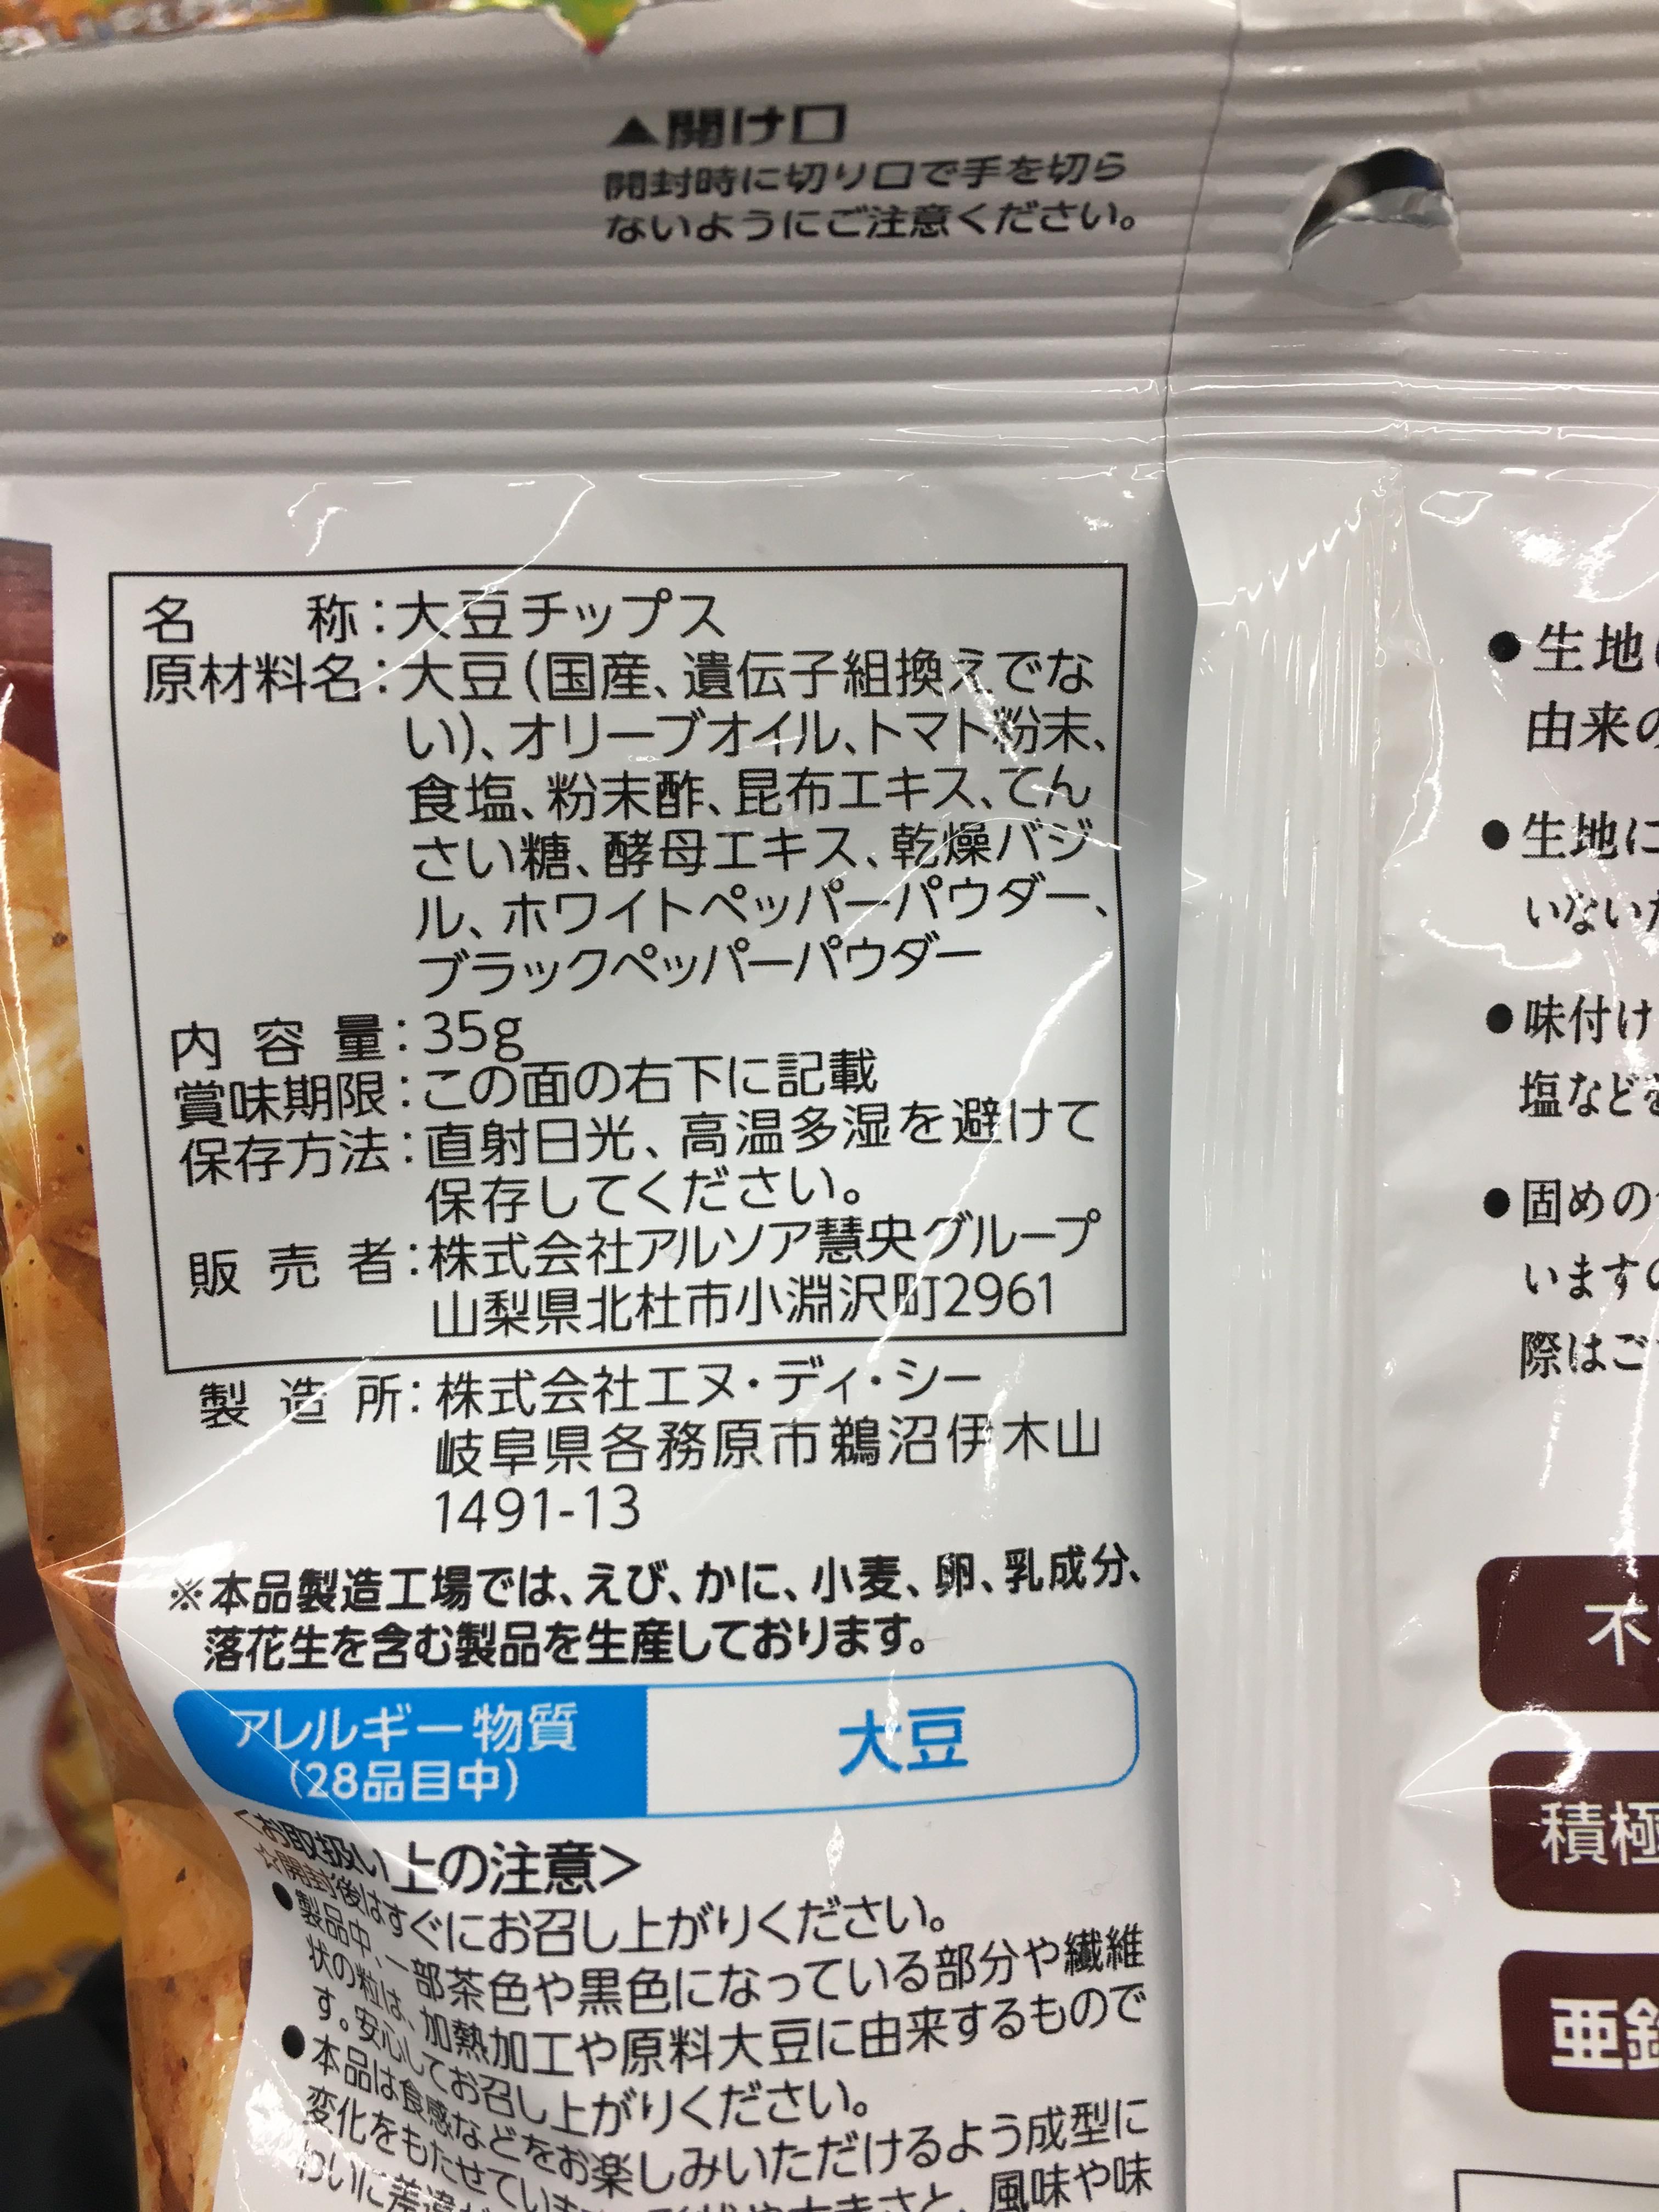 Biokura Soybean Chips Tomato Basil ingredient list